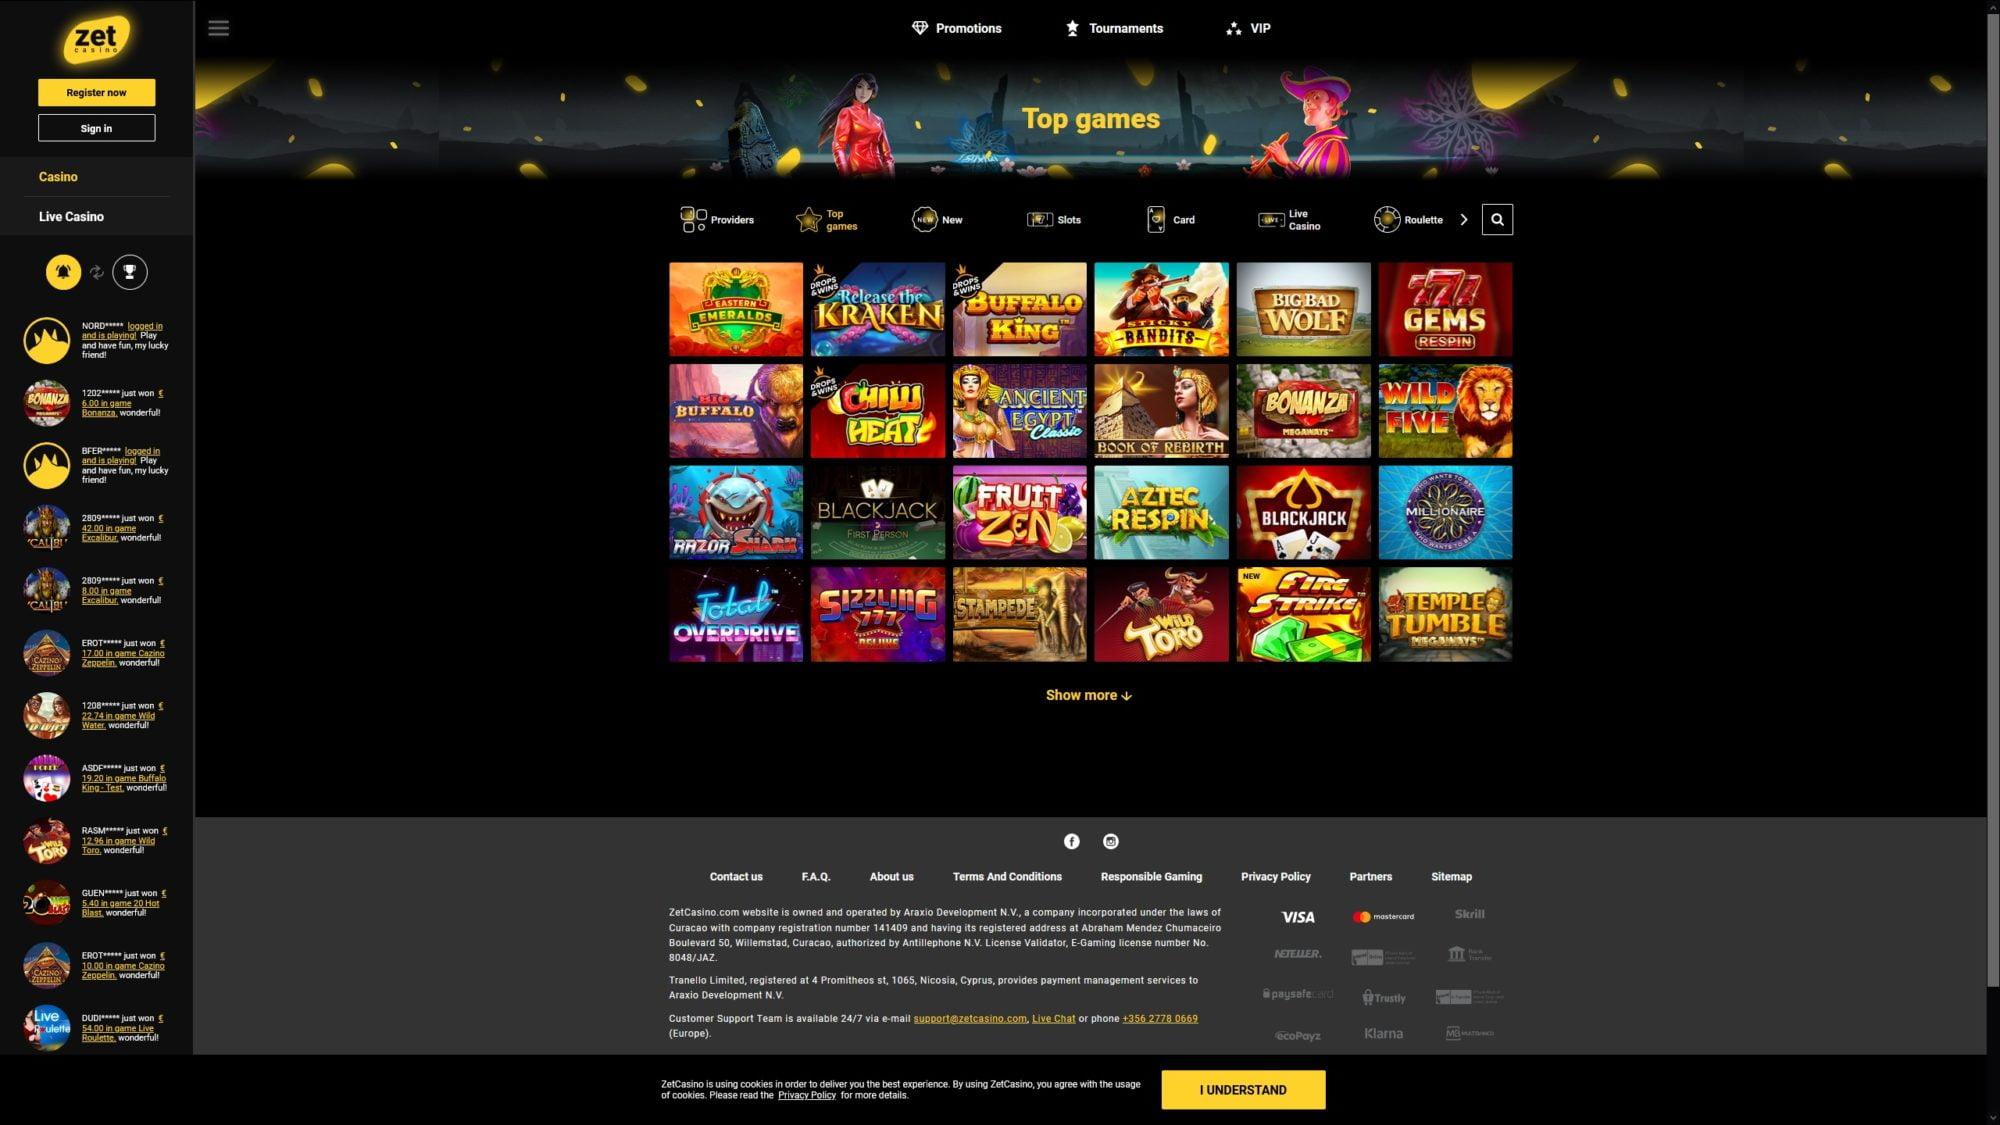 Try Zet Casinos Topgames